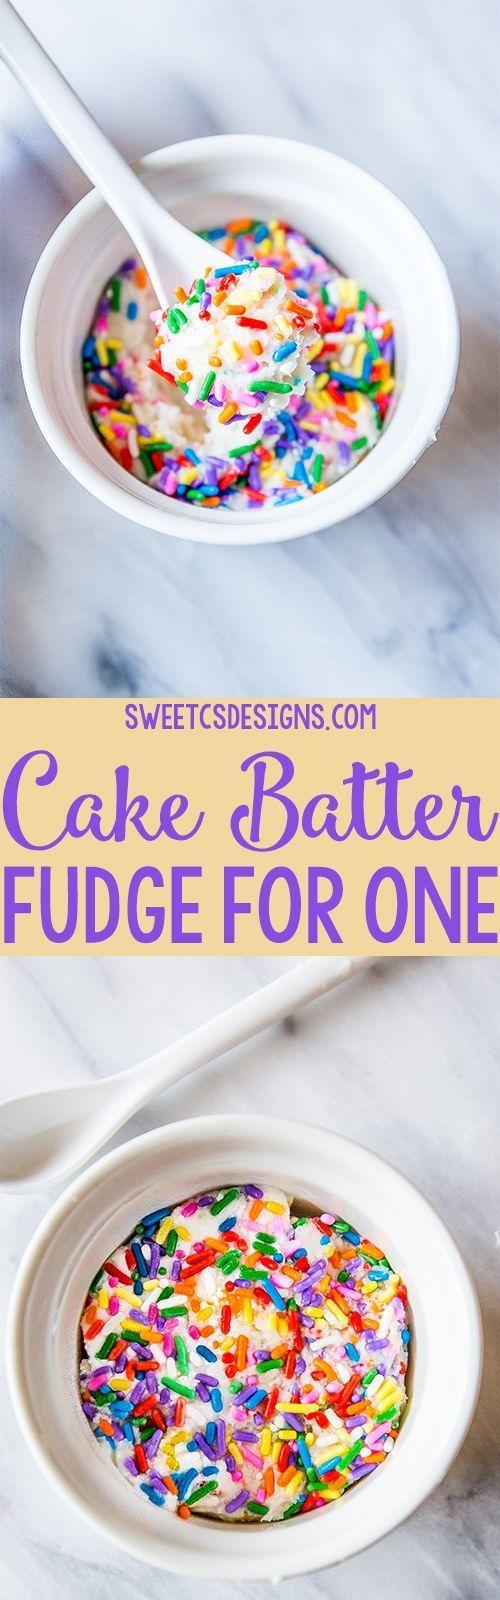 Cake Batter Fudge For One